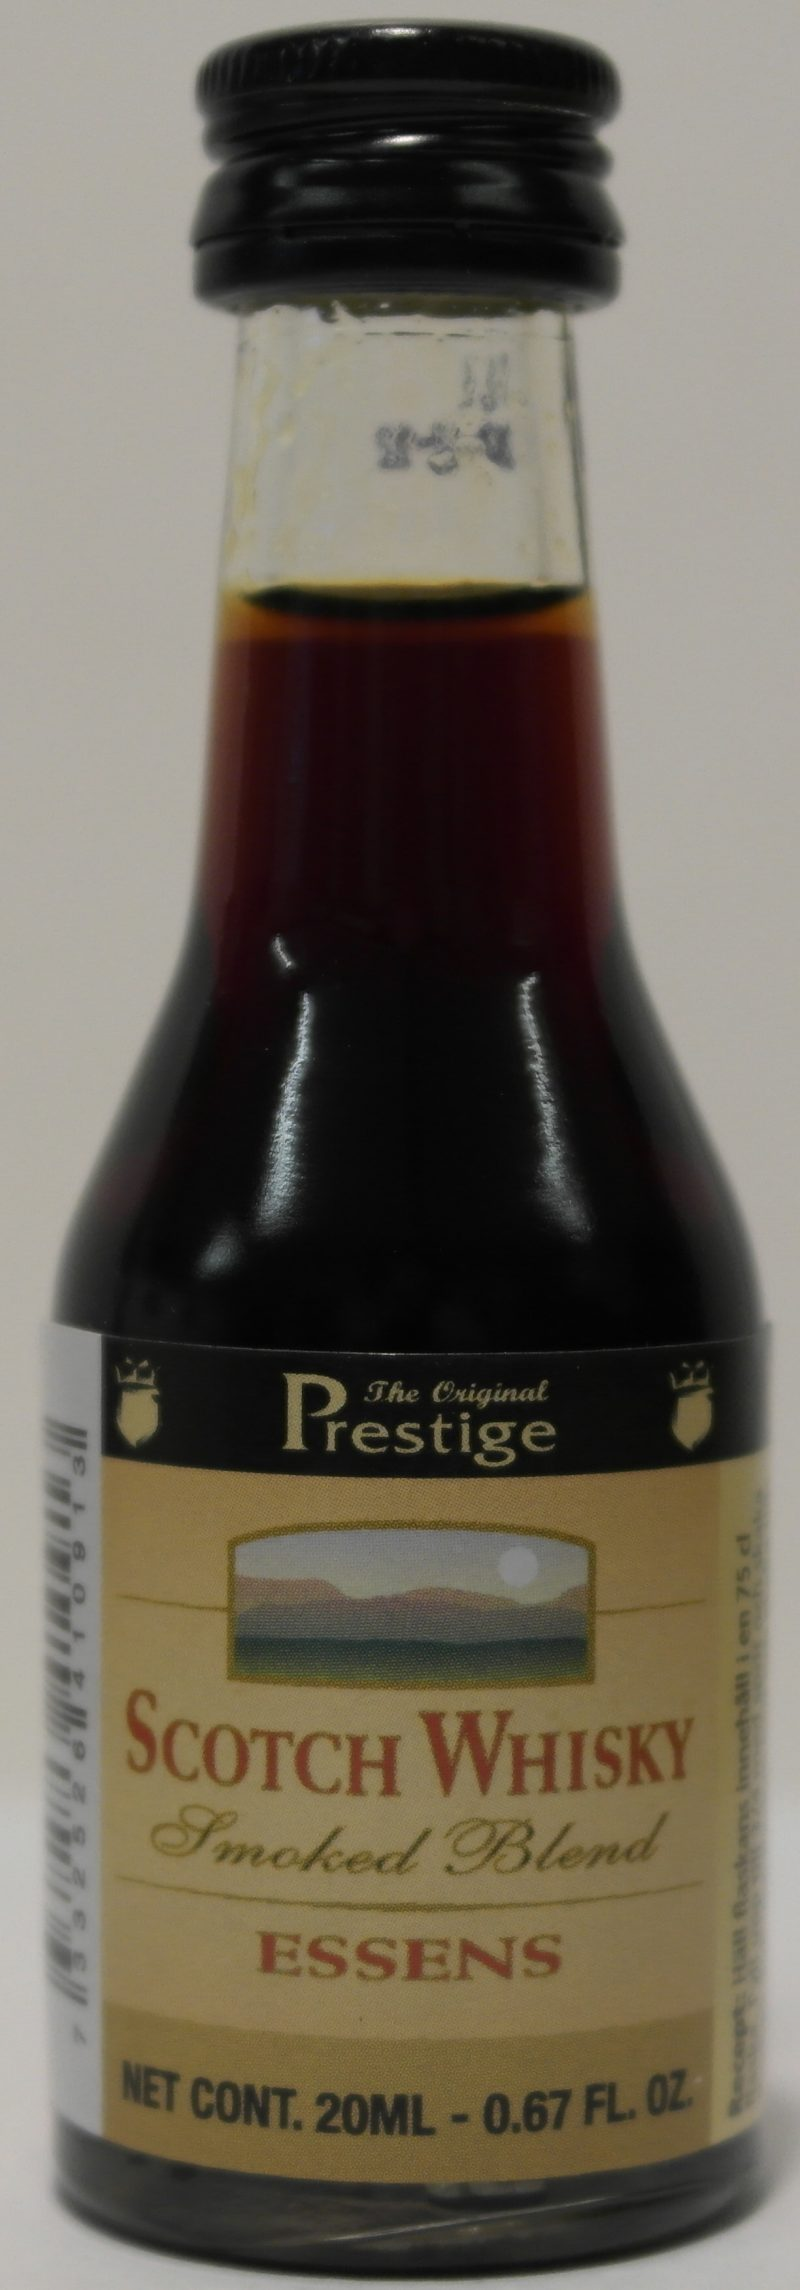 Prestige Scotch Whisky Smoked Blend Essens